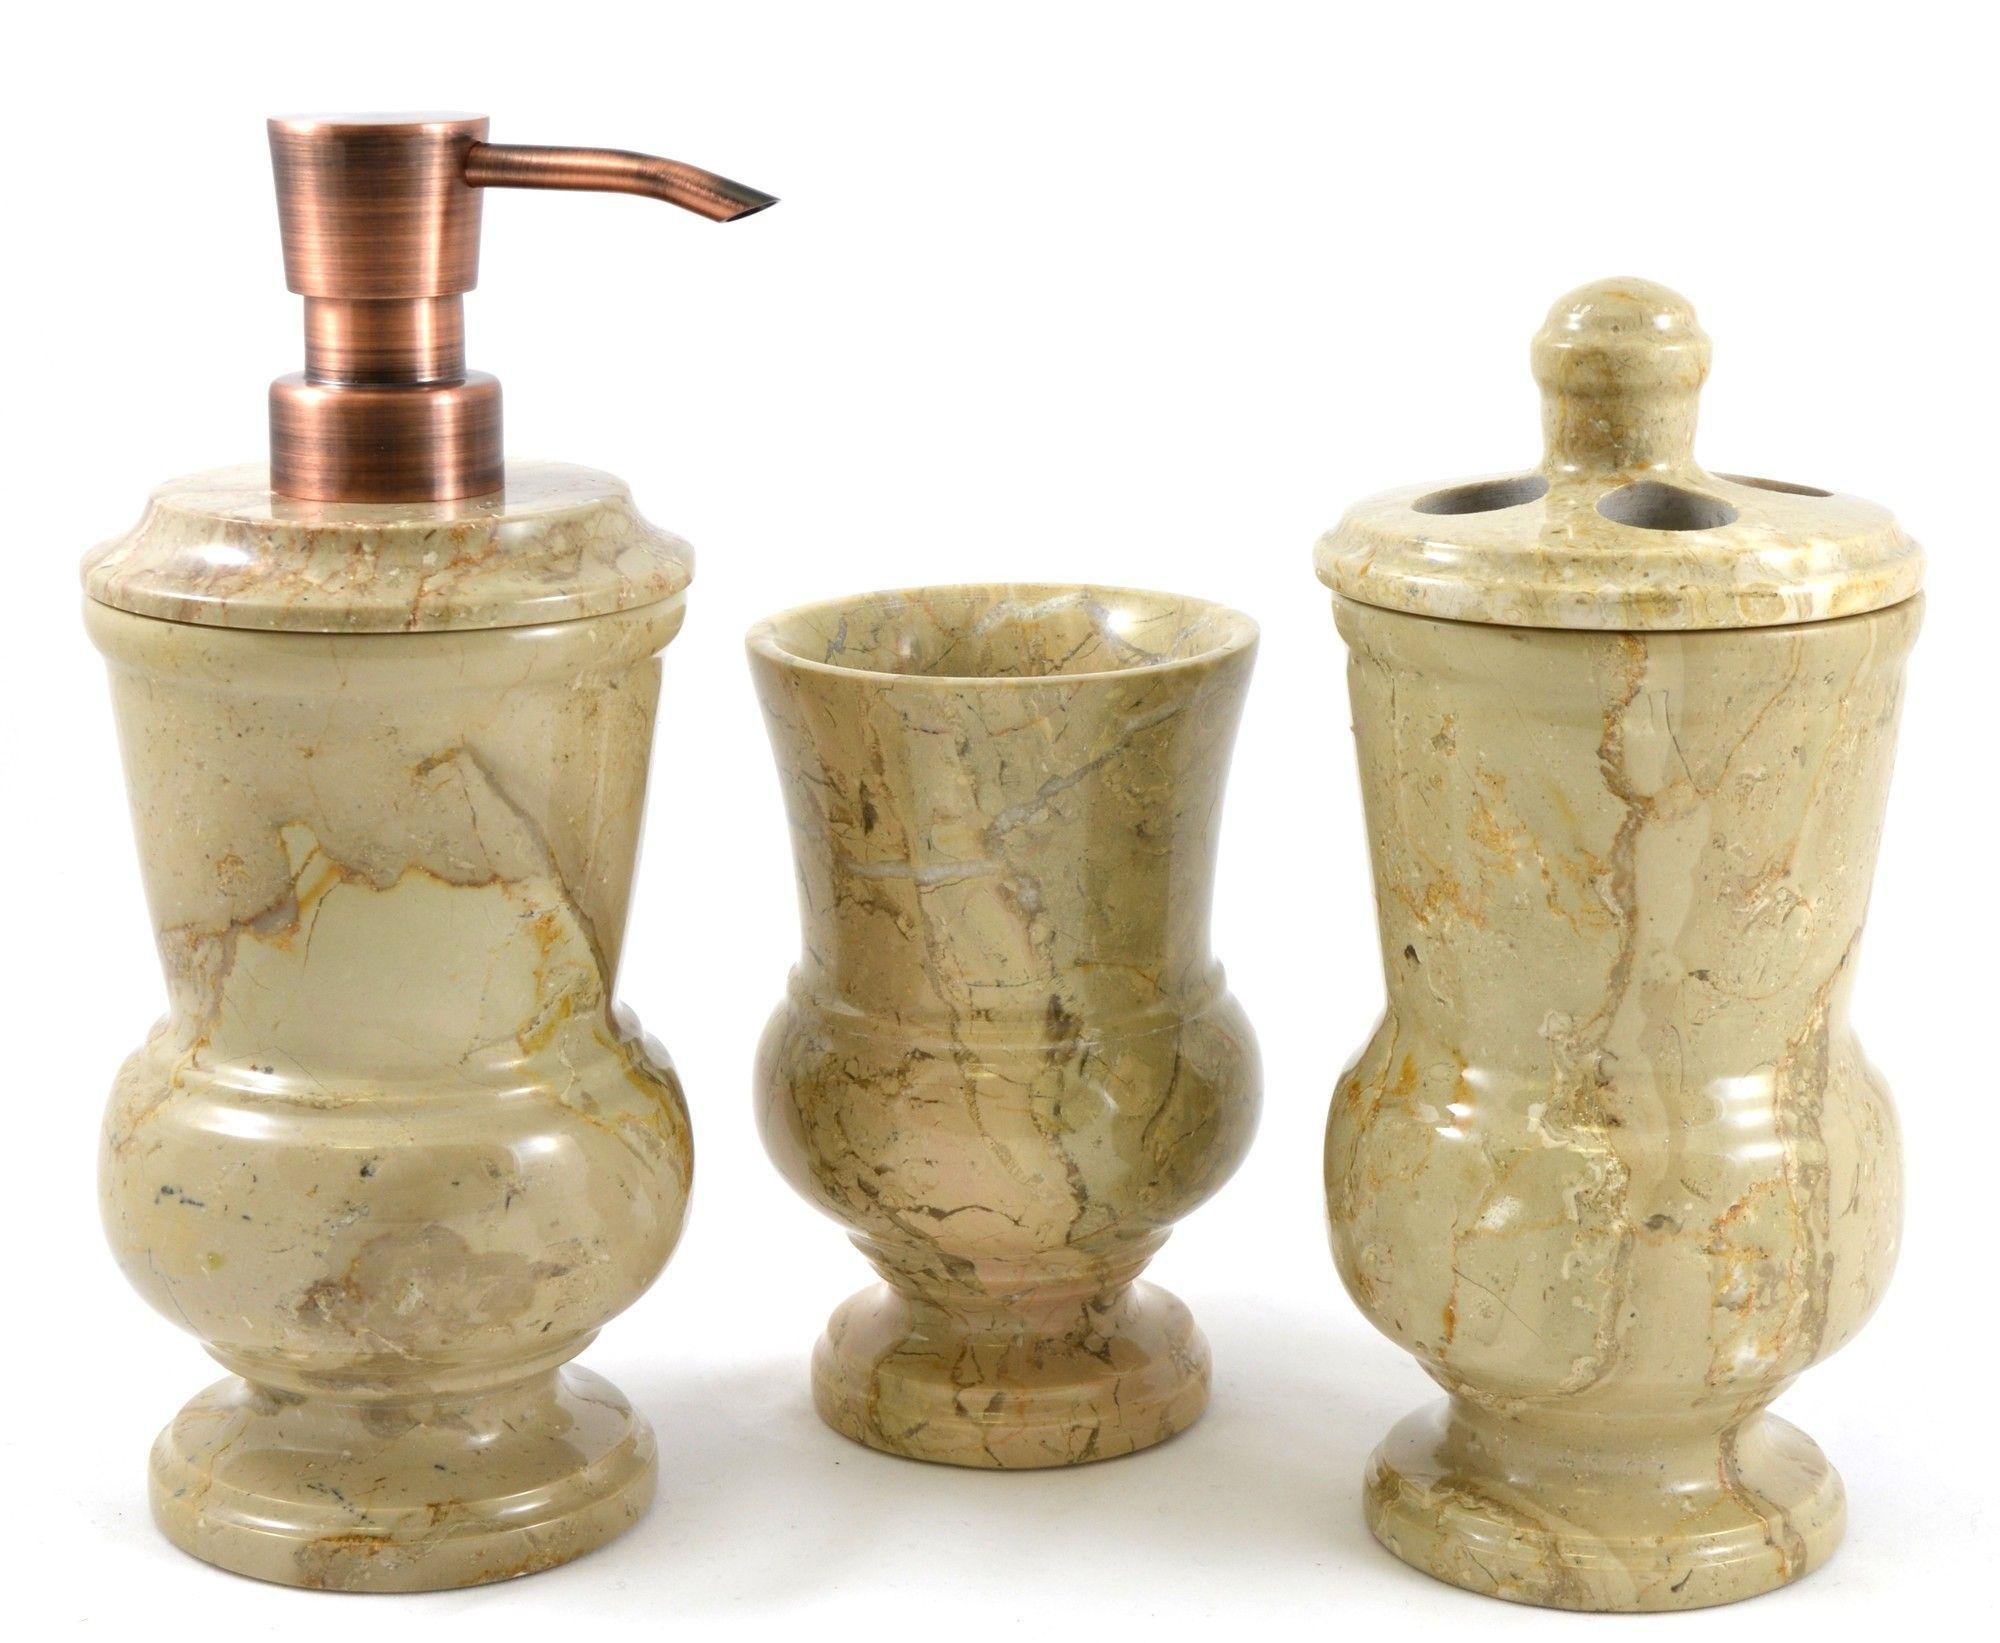 mediterranean 3 piece sahara beige marble bathroom accessory set, Badezimmer ideen